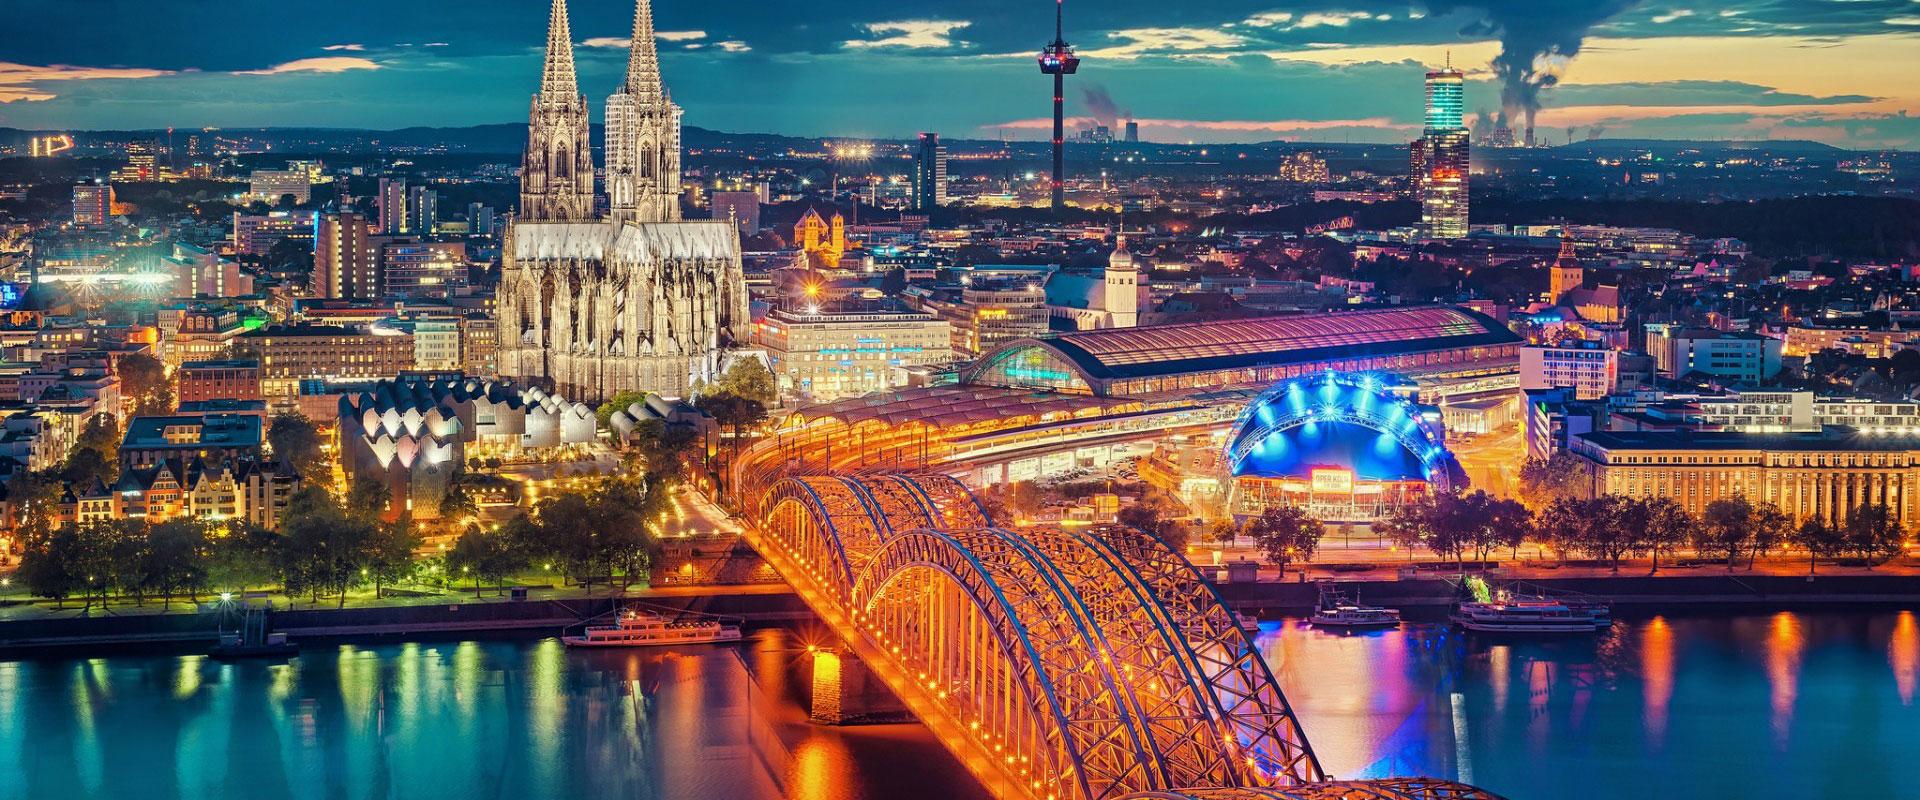 مهاجرت آسان به آلمان